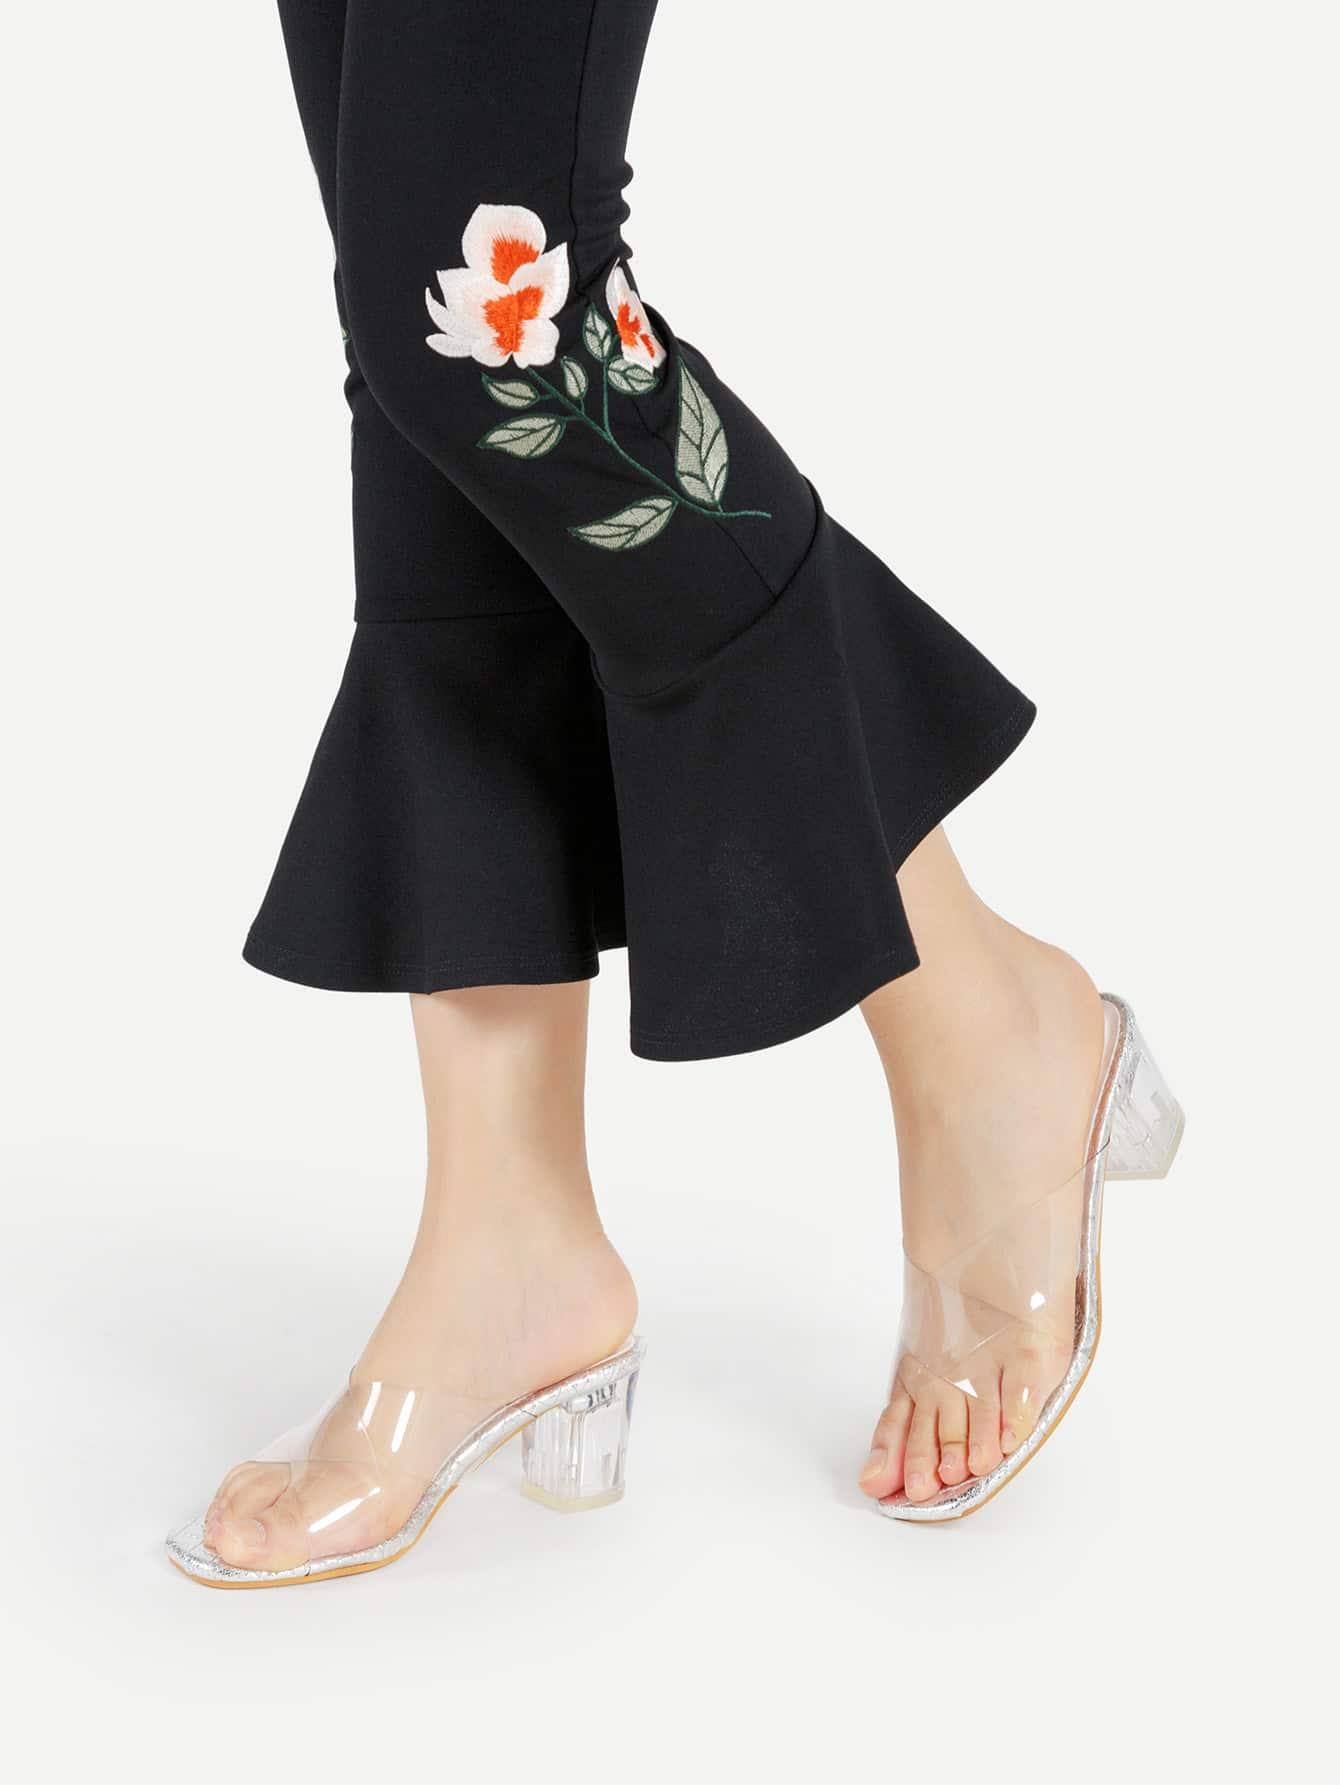 Clear Design Criss Cross Chunky Heeled Sandals